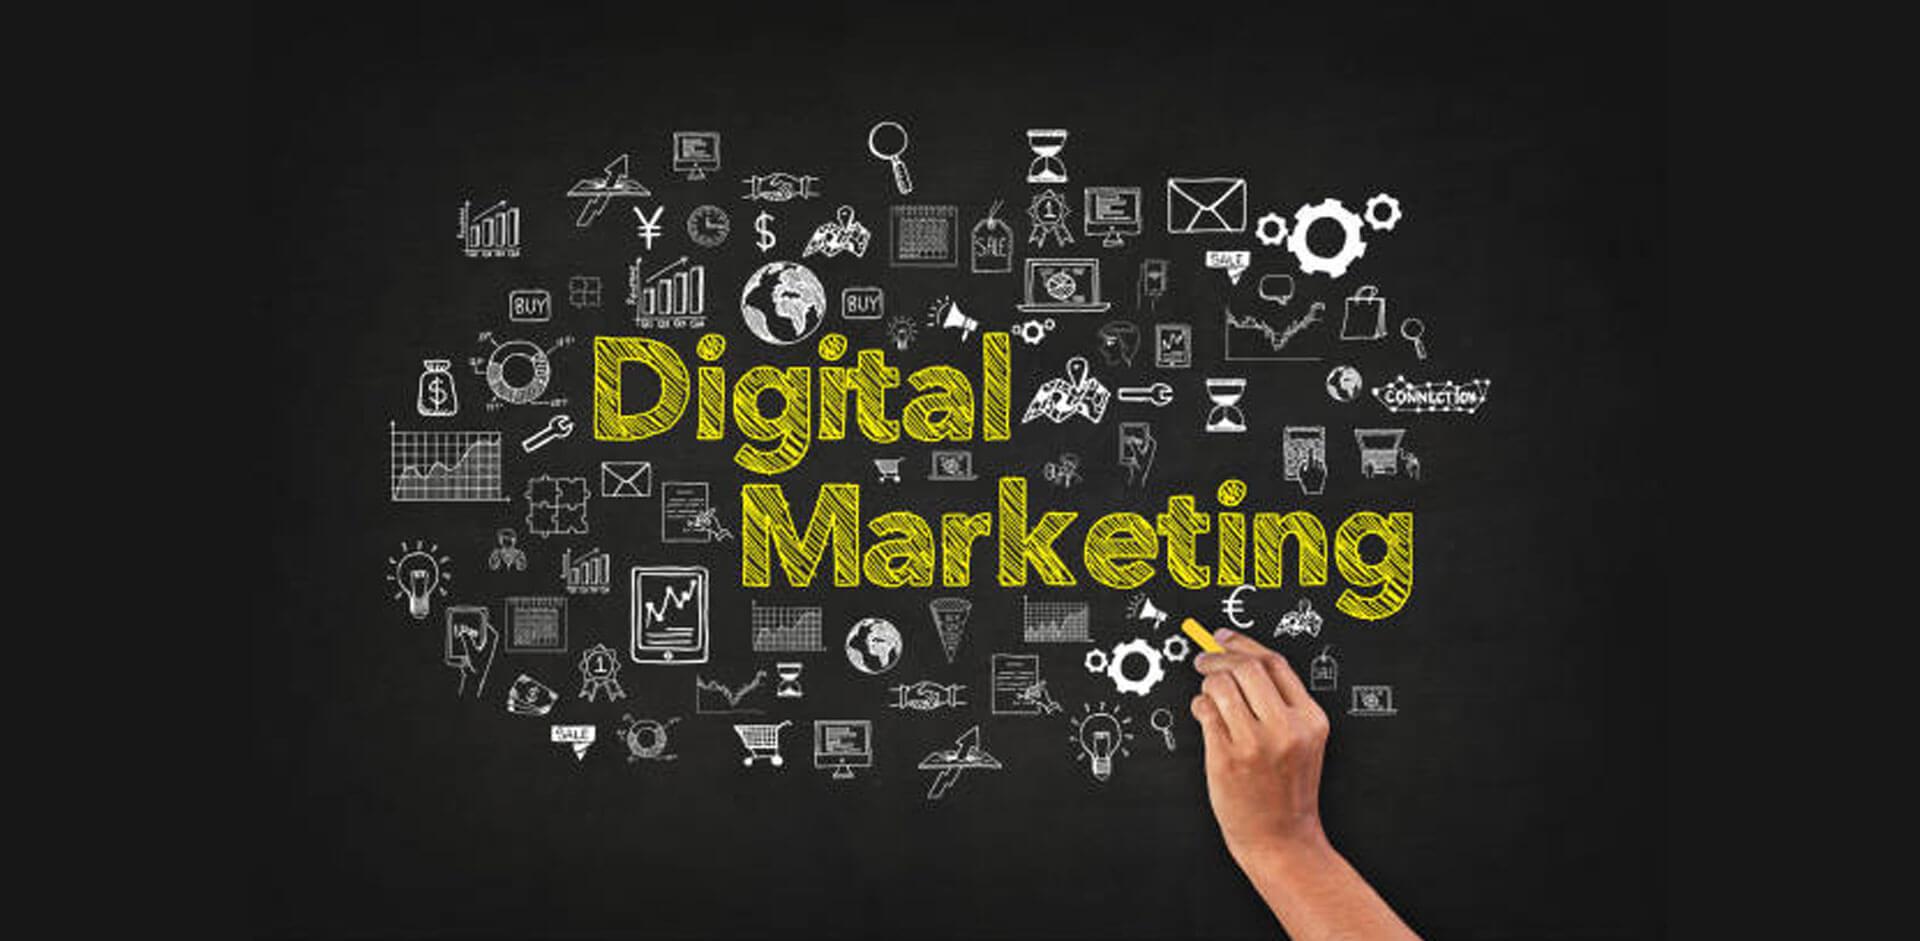 Strategie di marketing digitale, quali canali usare in azienda?